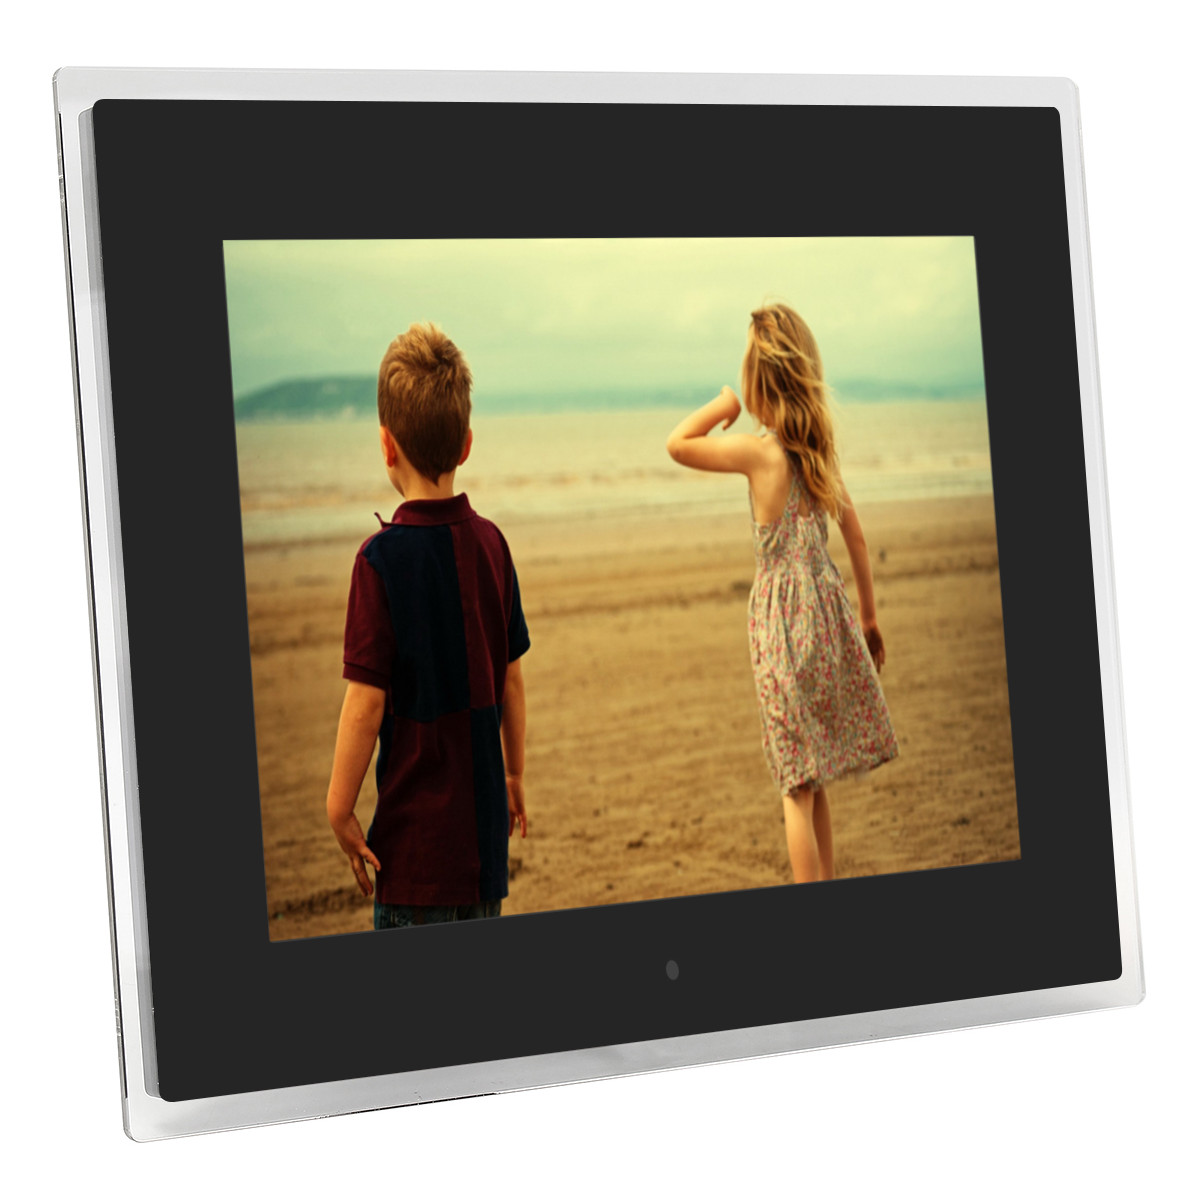 15 Black HD Digital Photo Frame 2GB SD Card USB MP3 Audio Video Photograph Hot Home Decor Photo High Definition